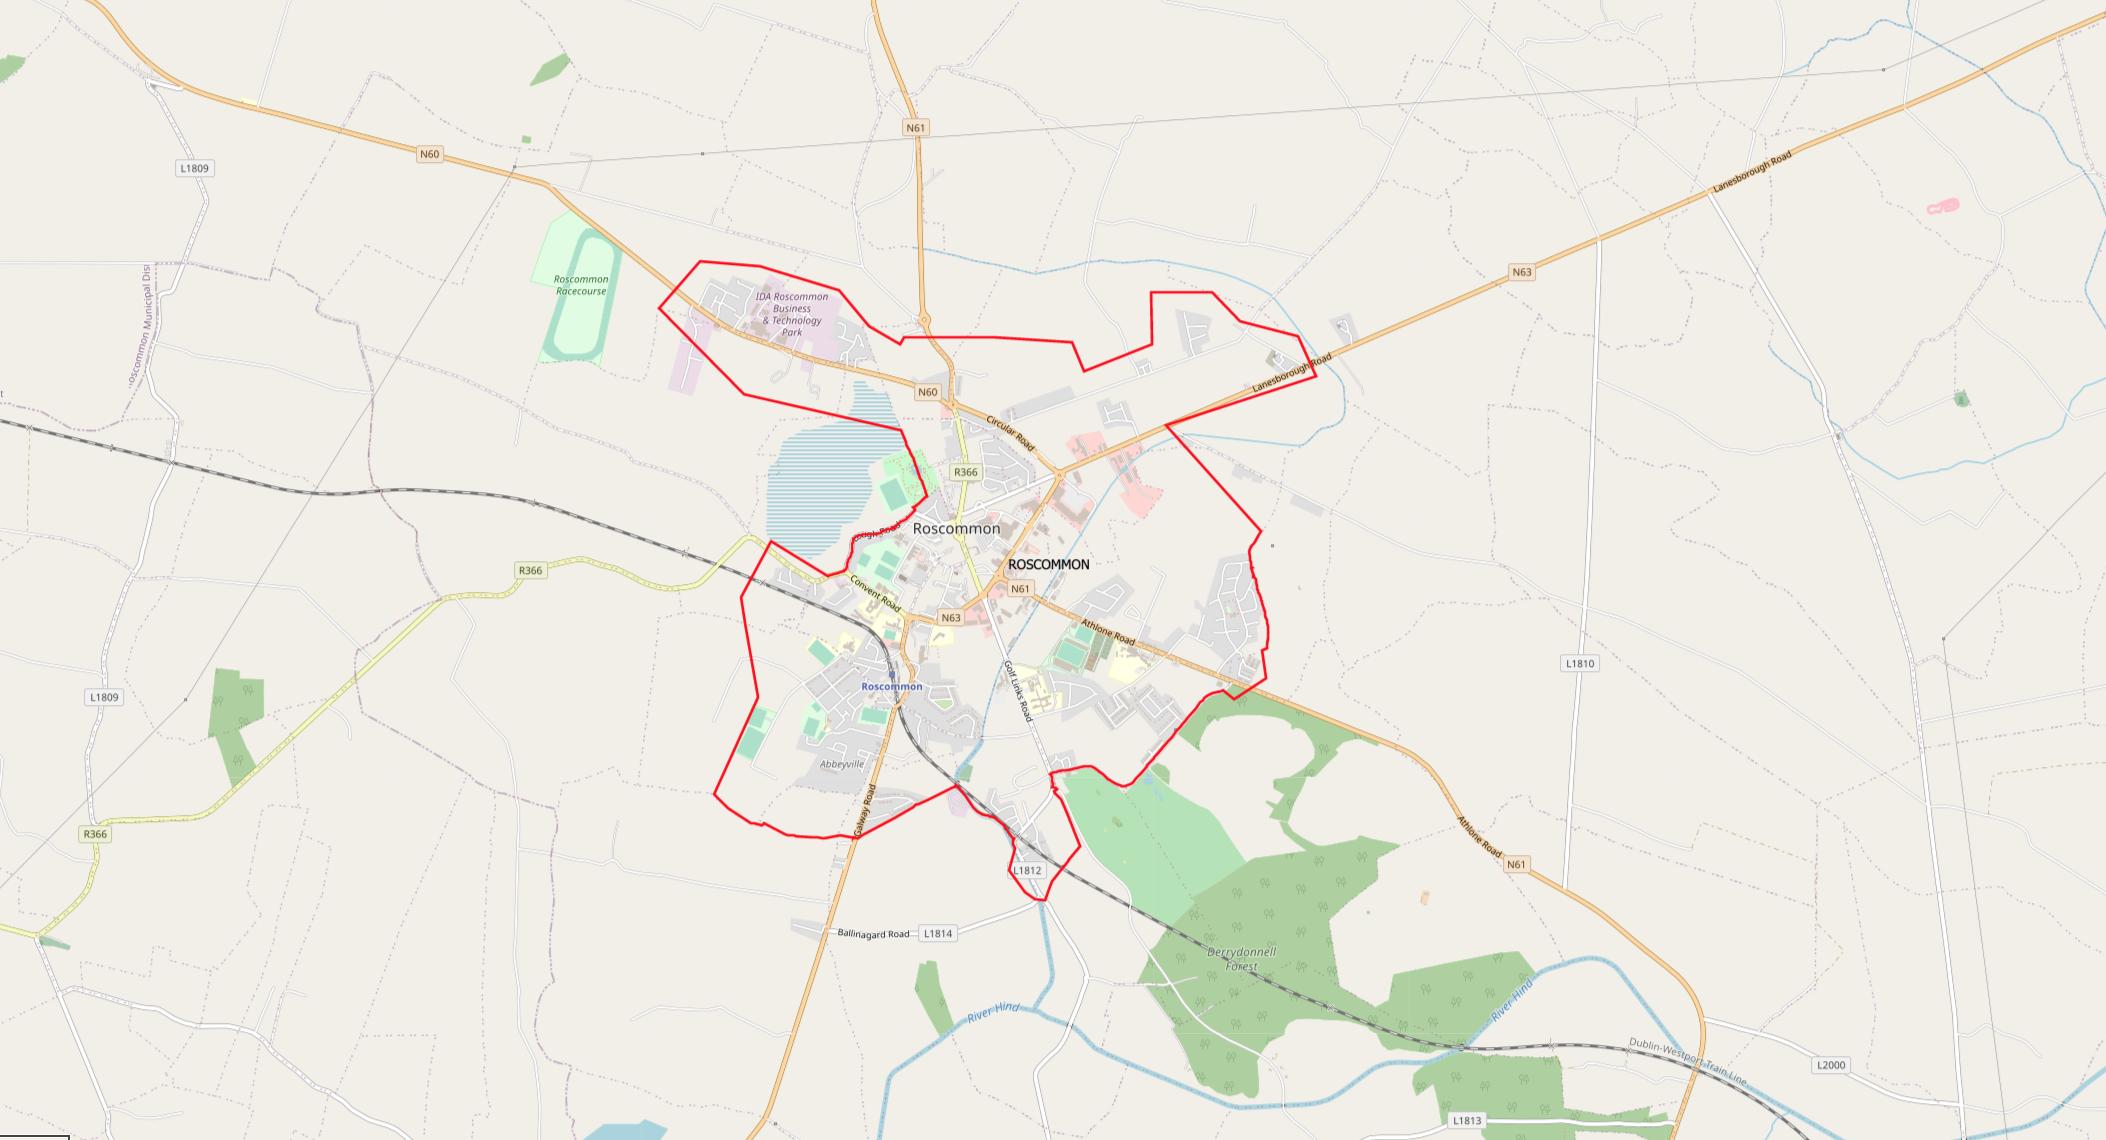 solar-panels-rosommon-town-ireland-map-img